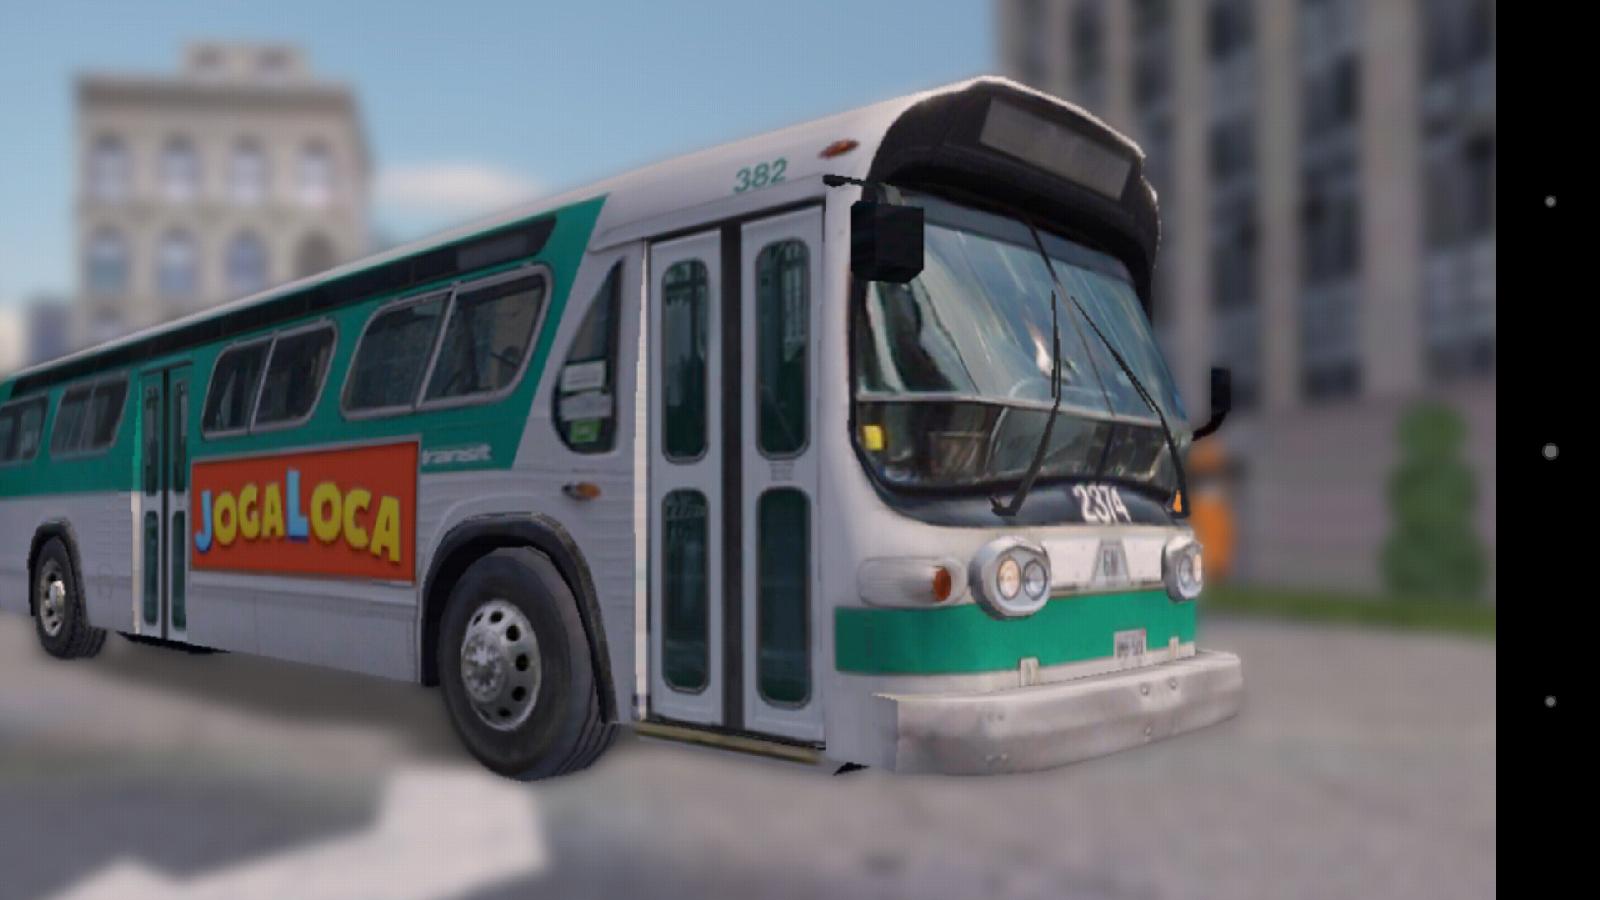 Меню - Bus Parking для Android